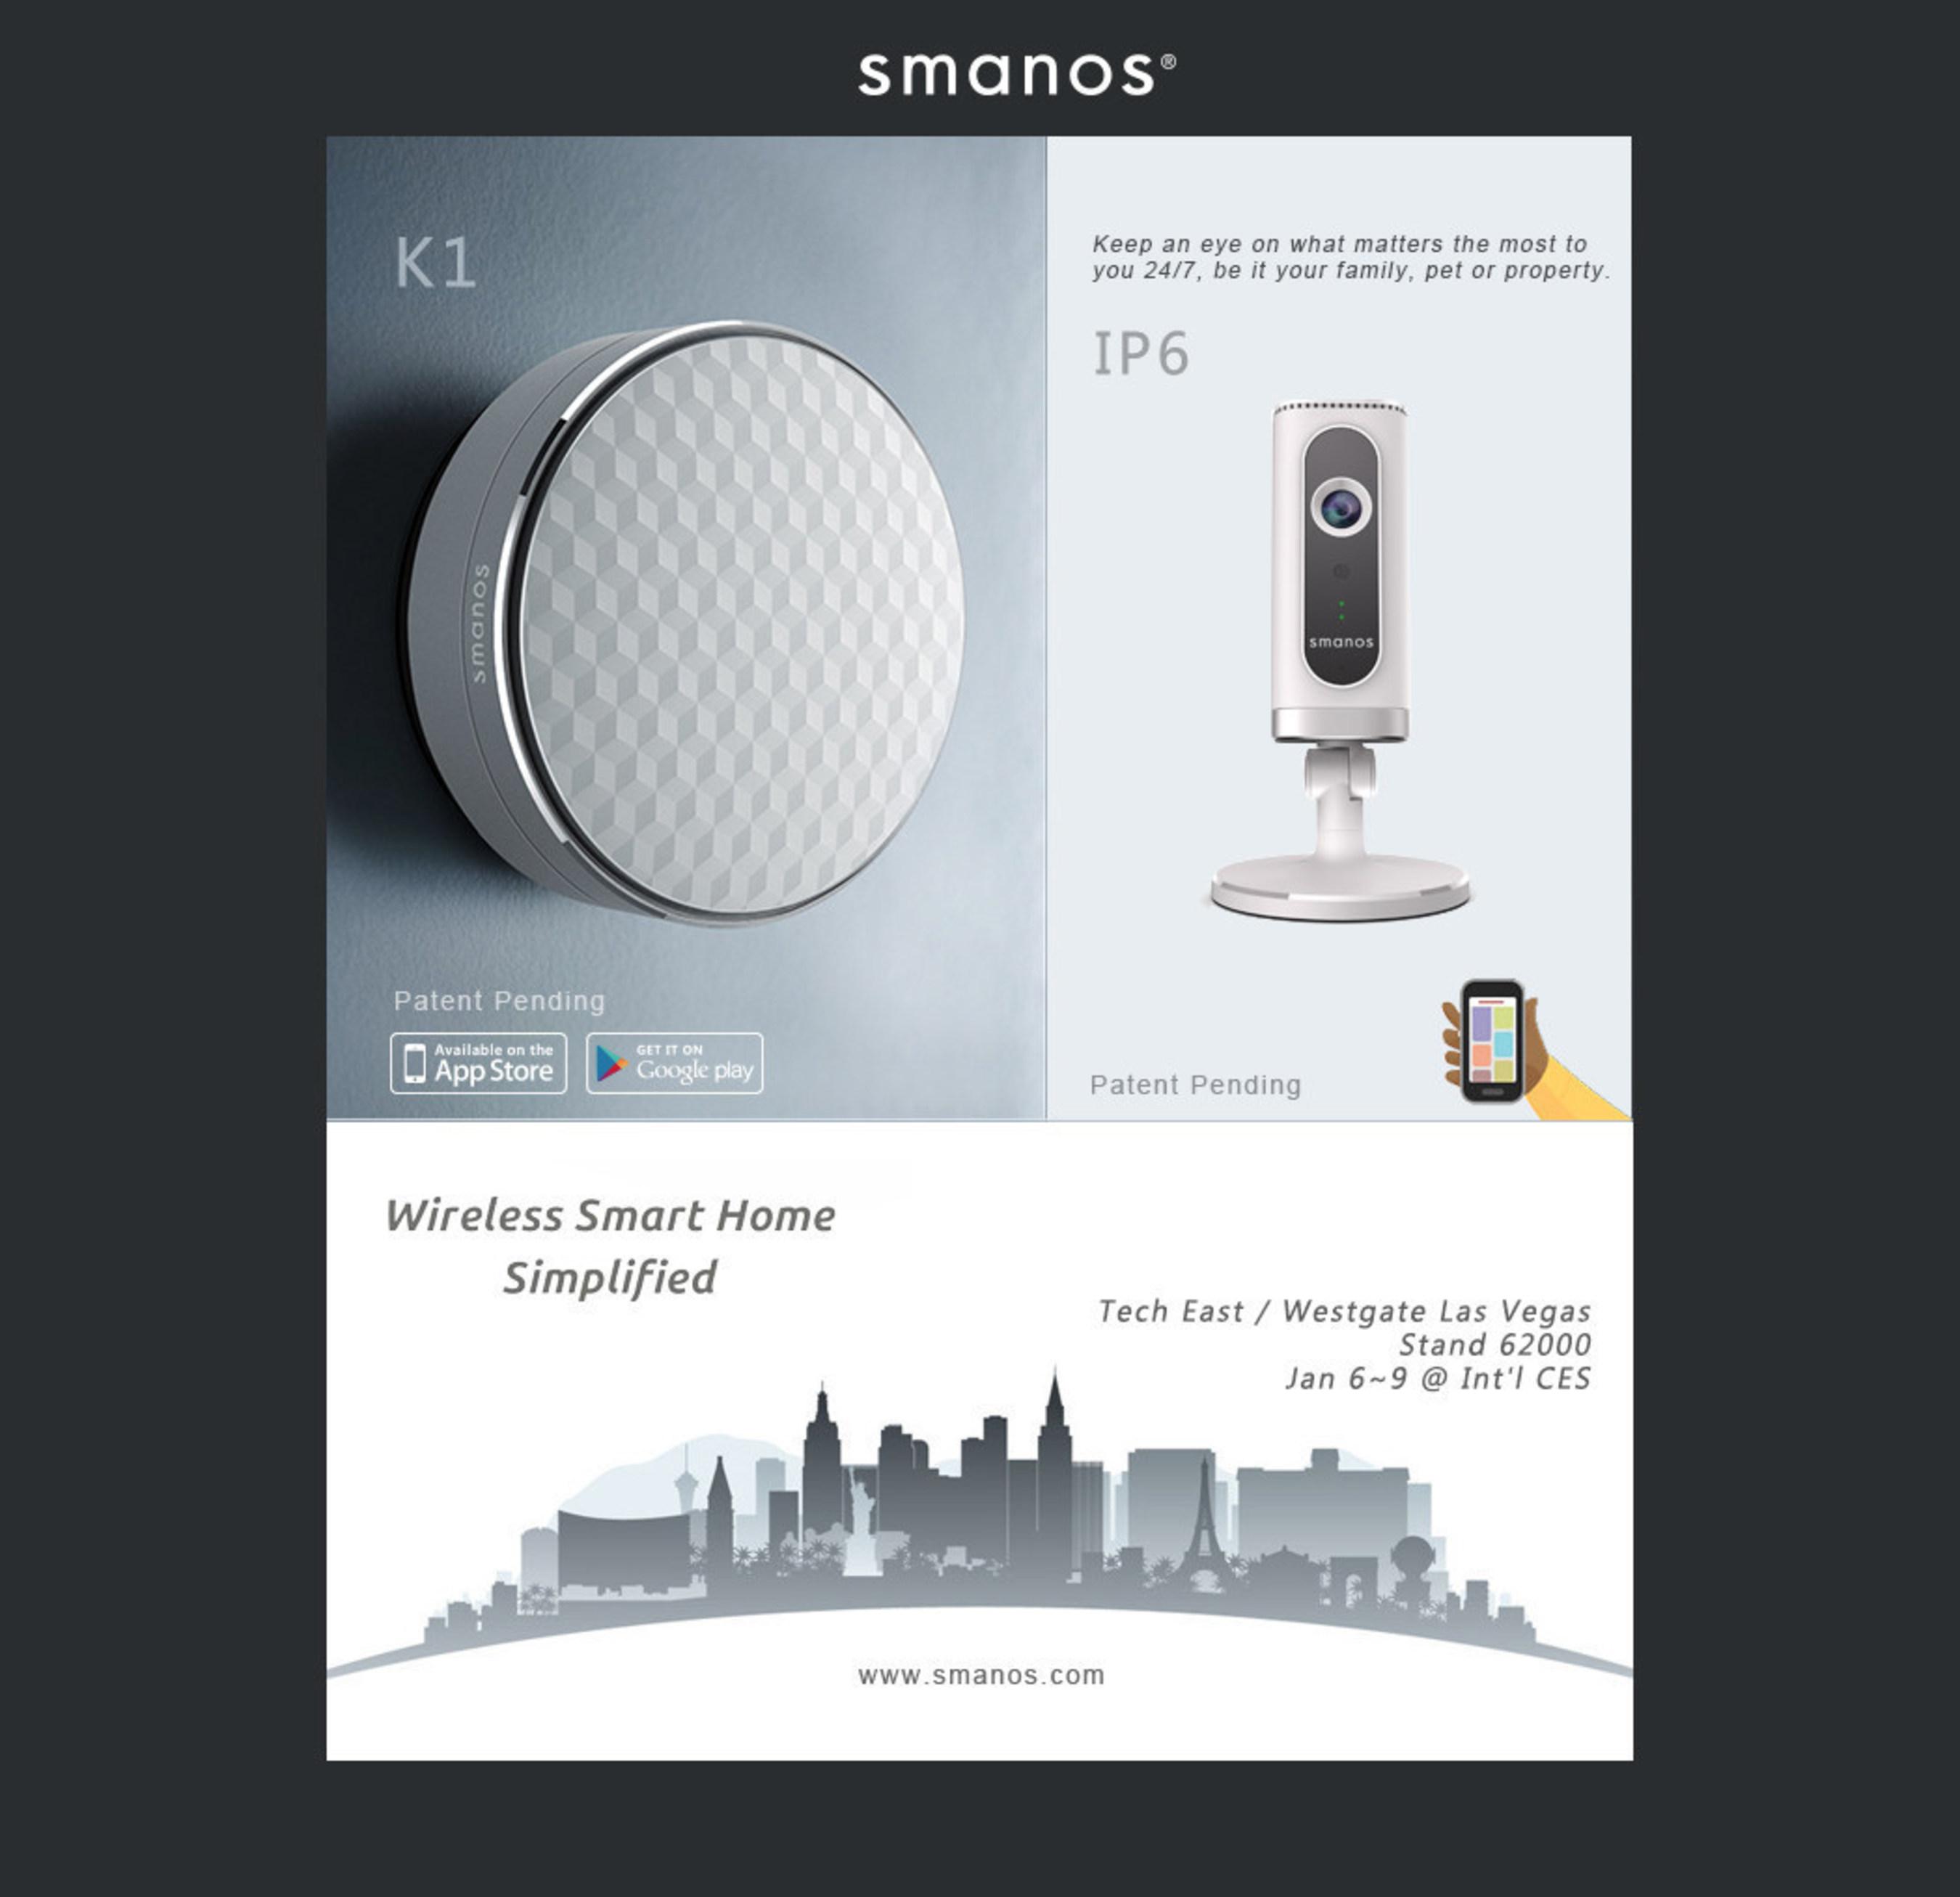 Smart Home Guru Smanos Unveils New Hub And Wifi Camera At